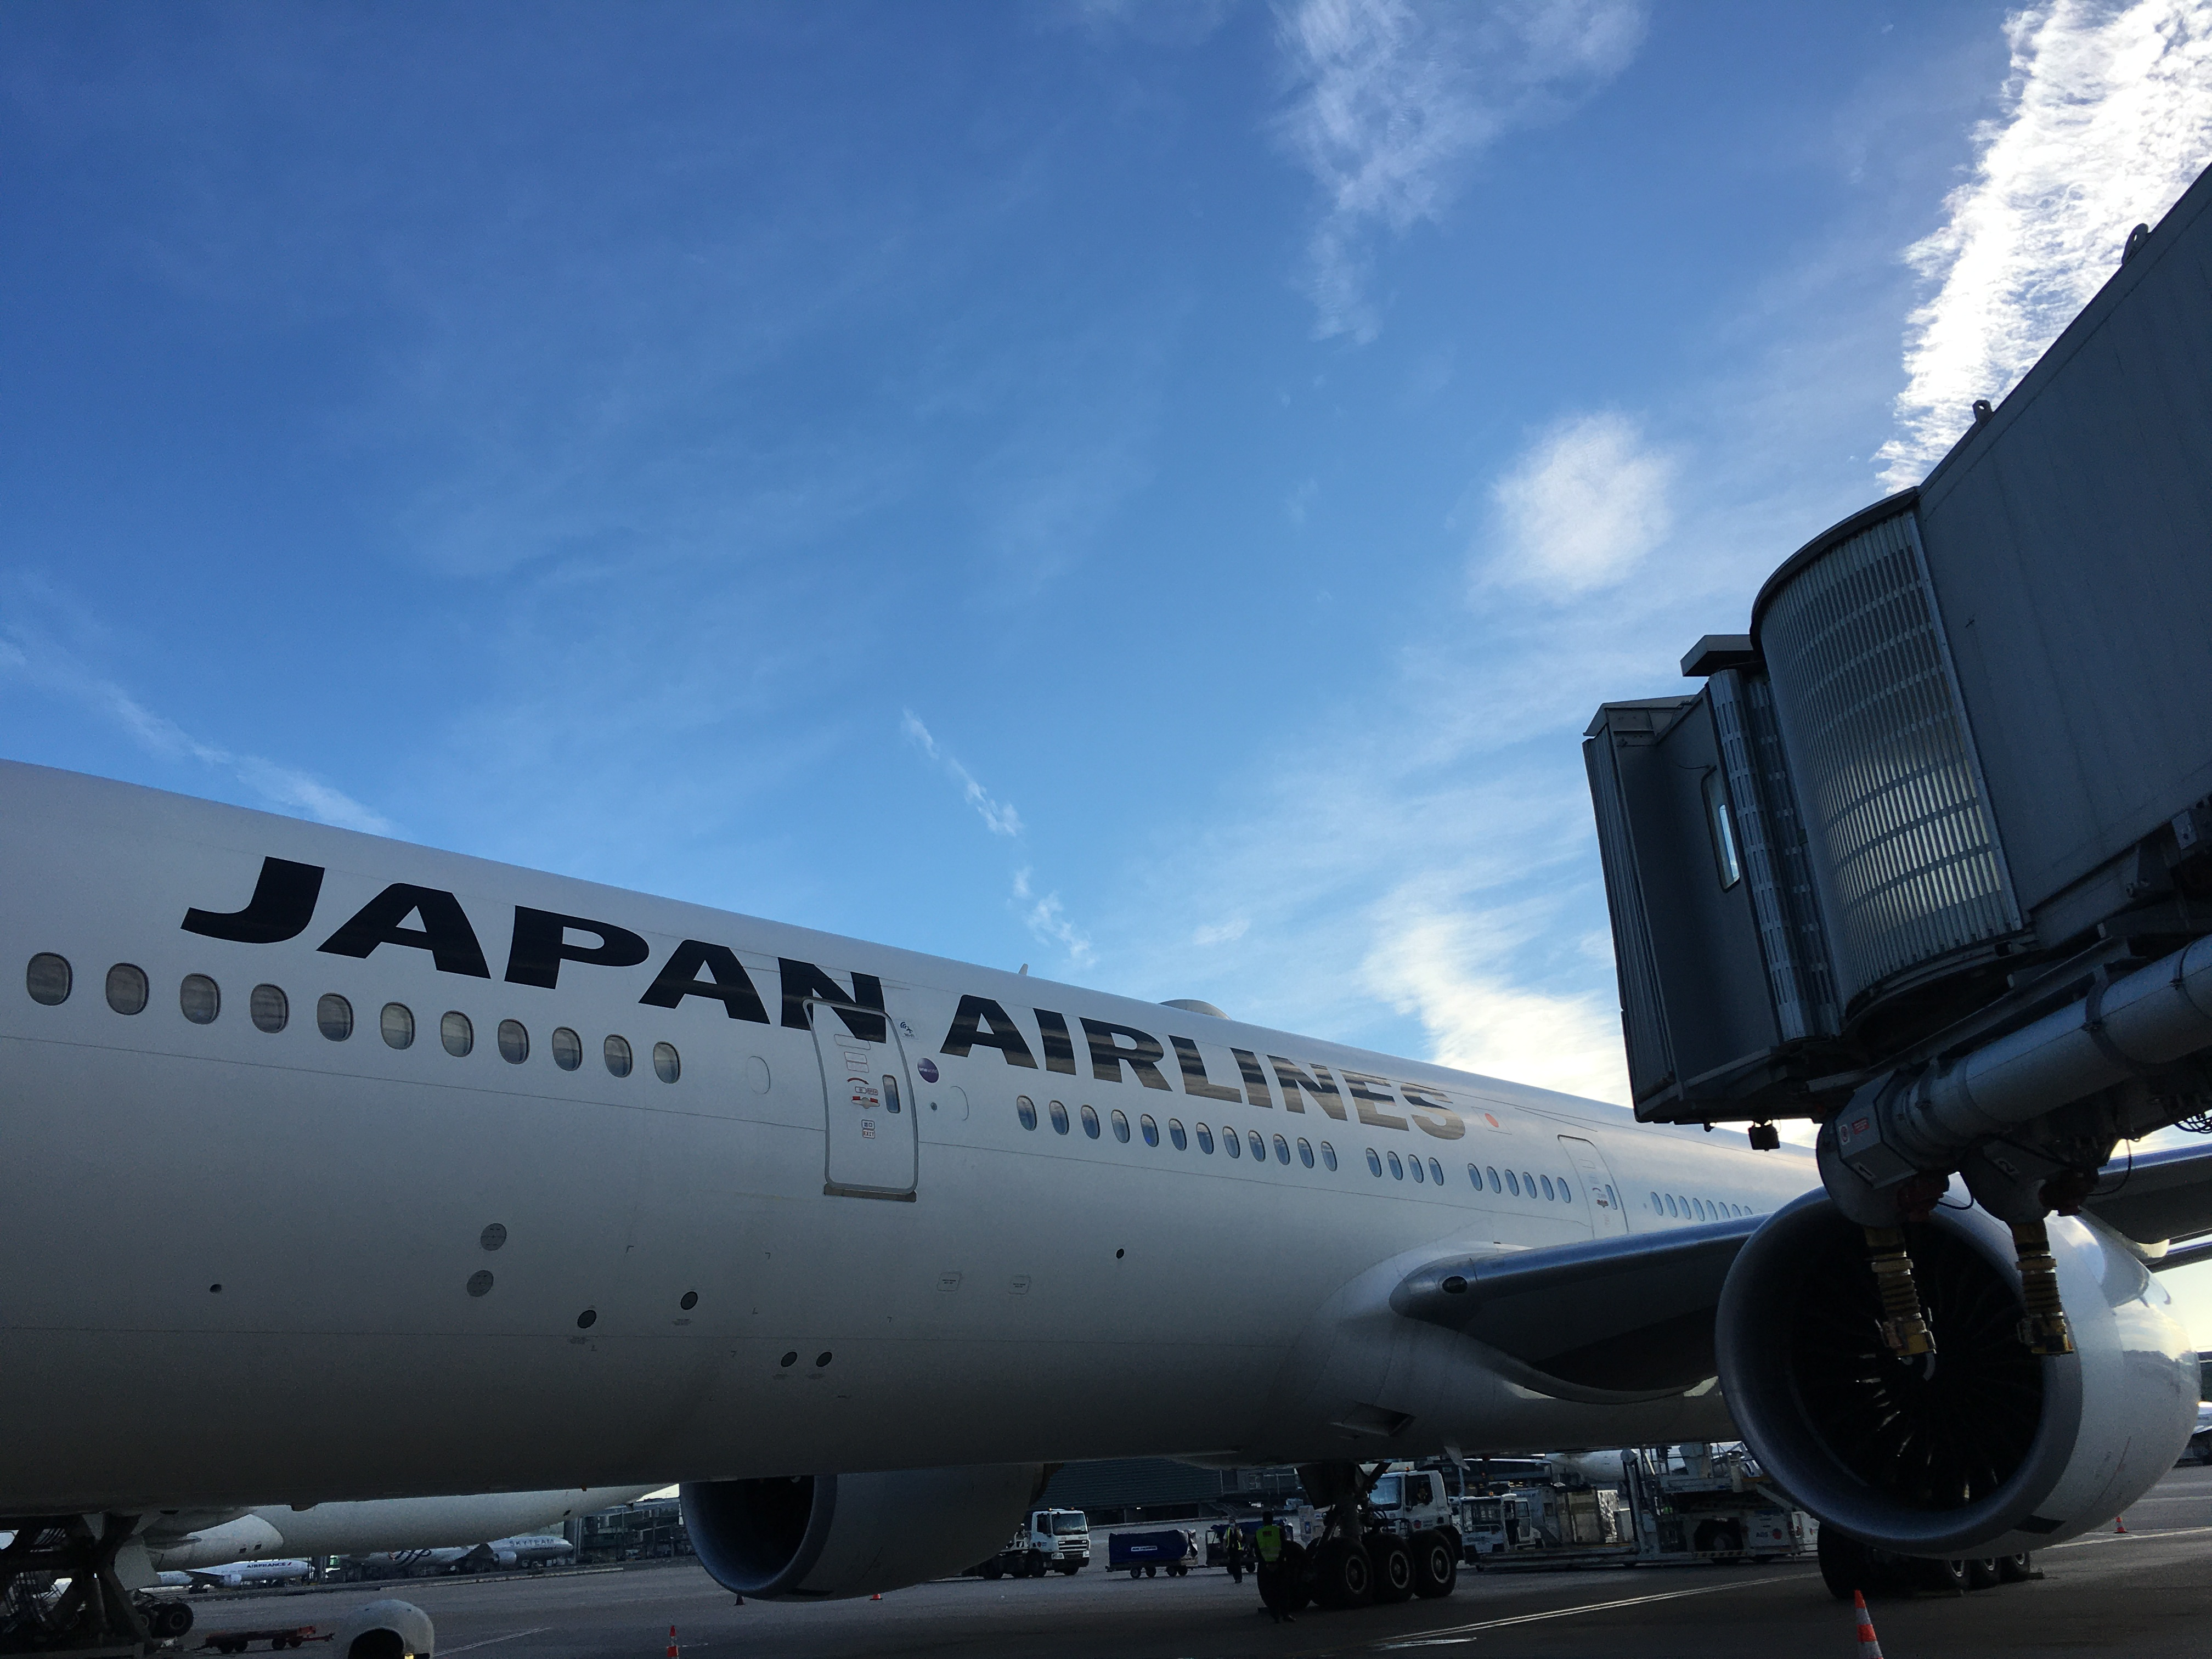 Business Class Review : 日本航空(JL) JL46  パリシャルル・ド・ゴール(CDG) – 羽田(HND)